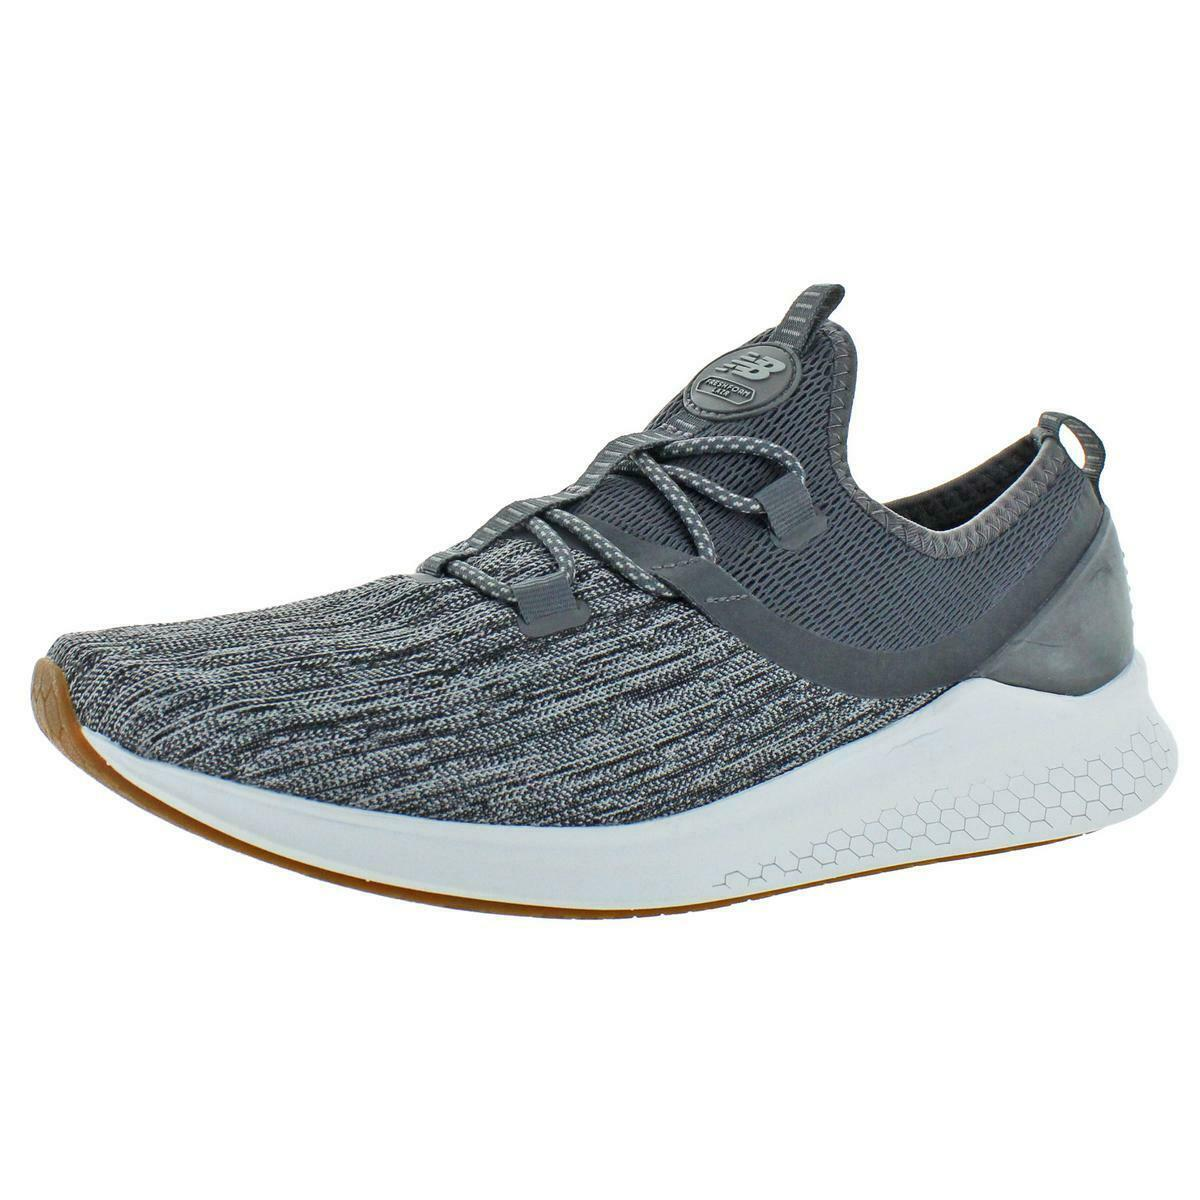 New Balance Mens Lazr Athletic Fresh Foam Running shoes Sneakers BHFO 5061